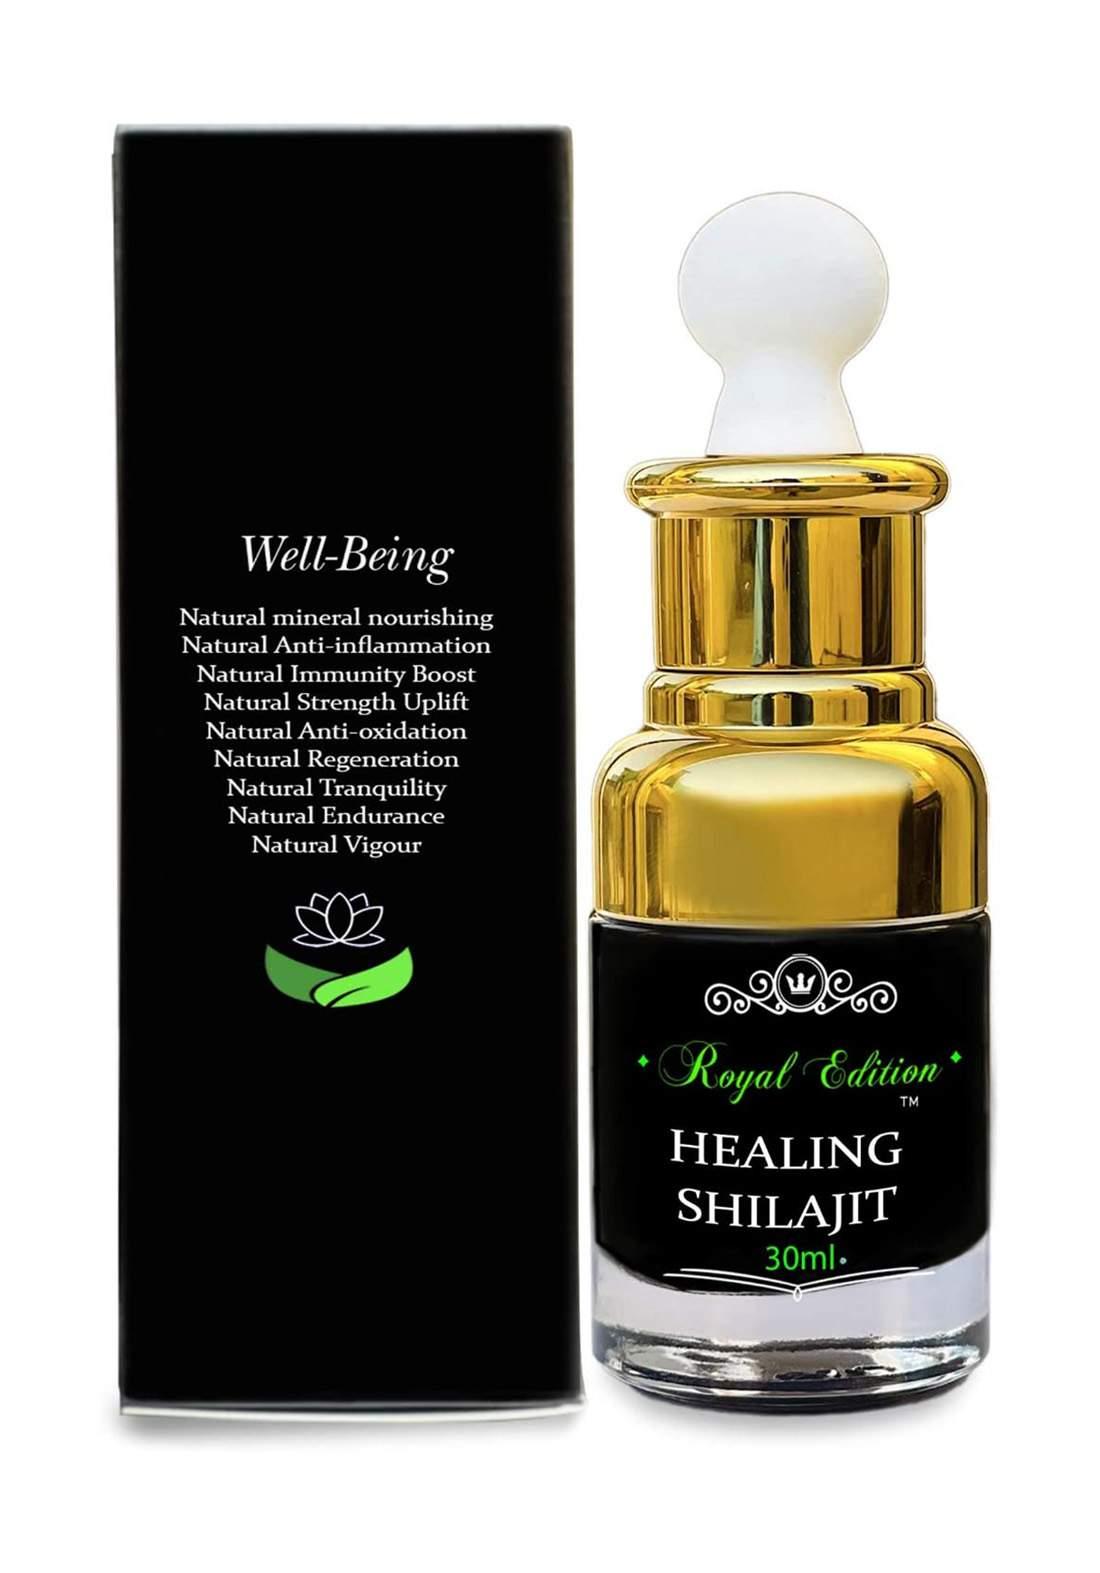 Royal Edition Healing Shilajit 30ml الشيلاجيت النقي